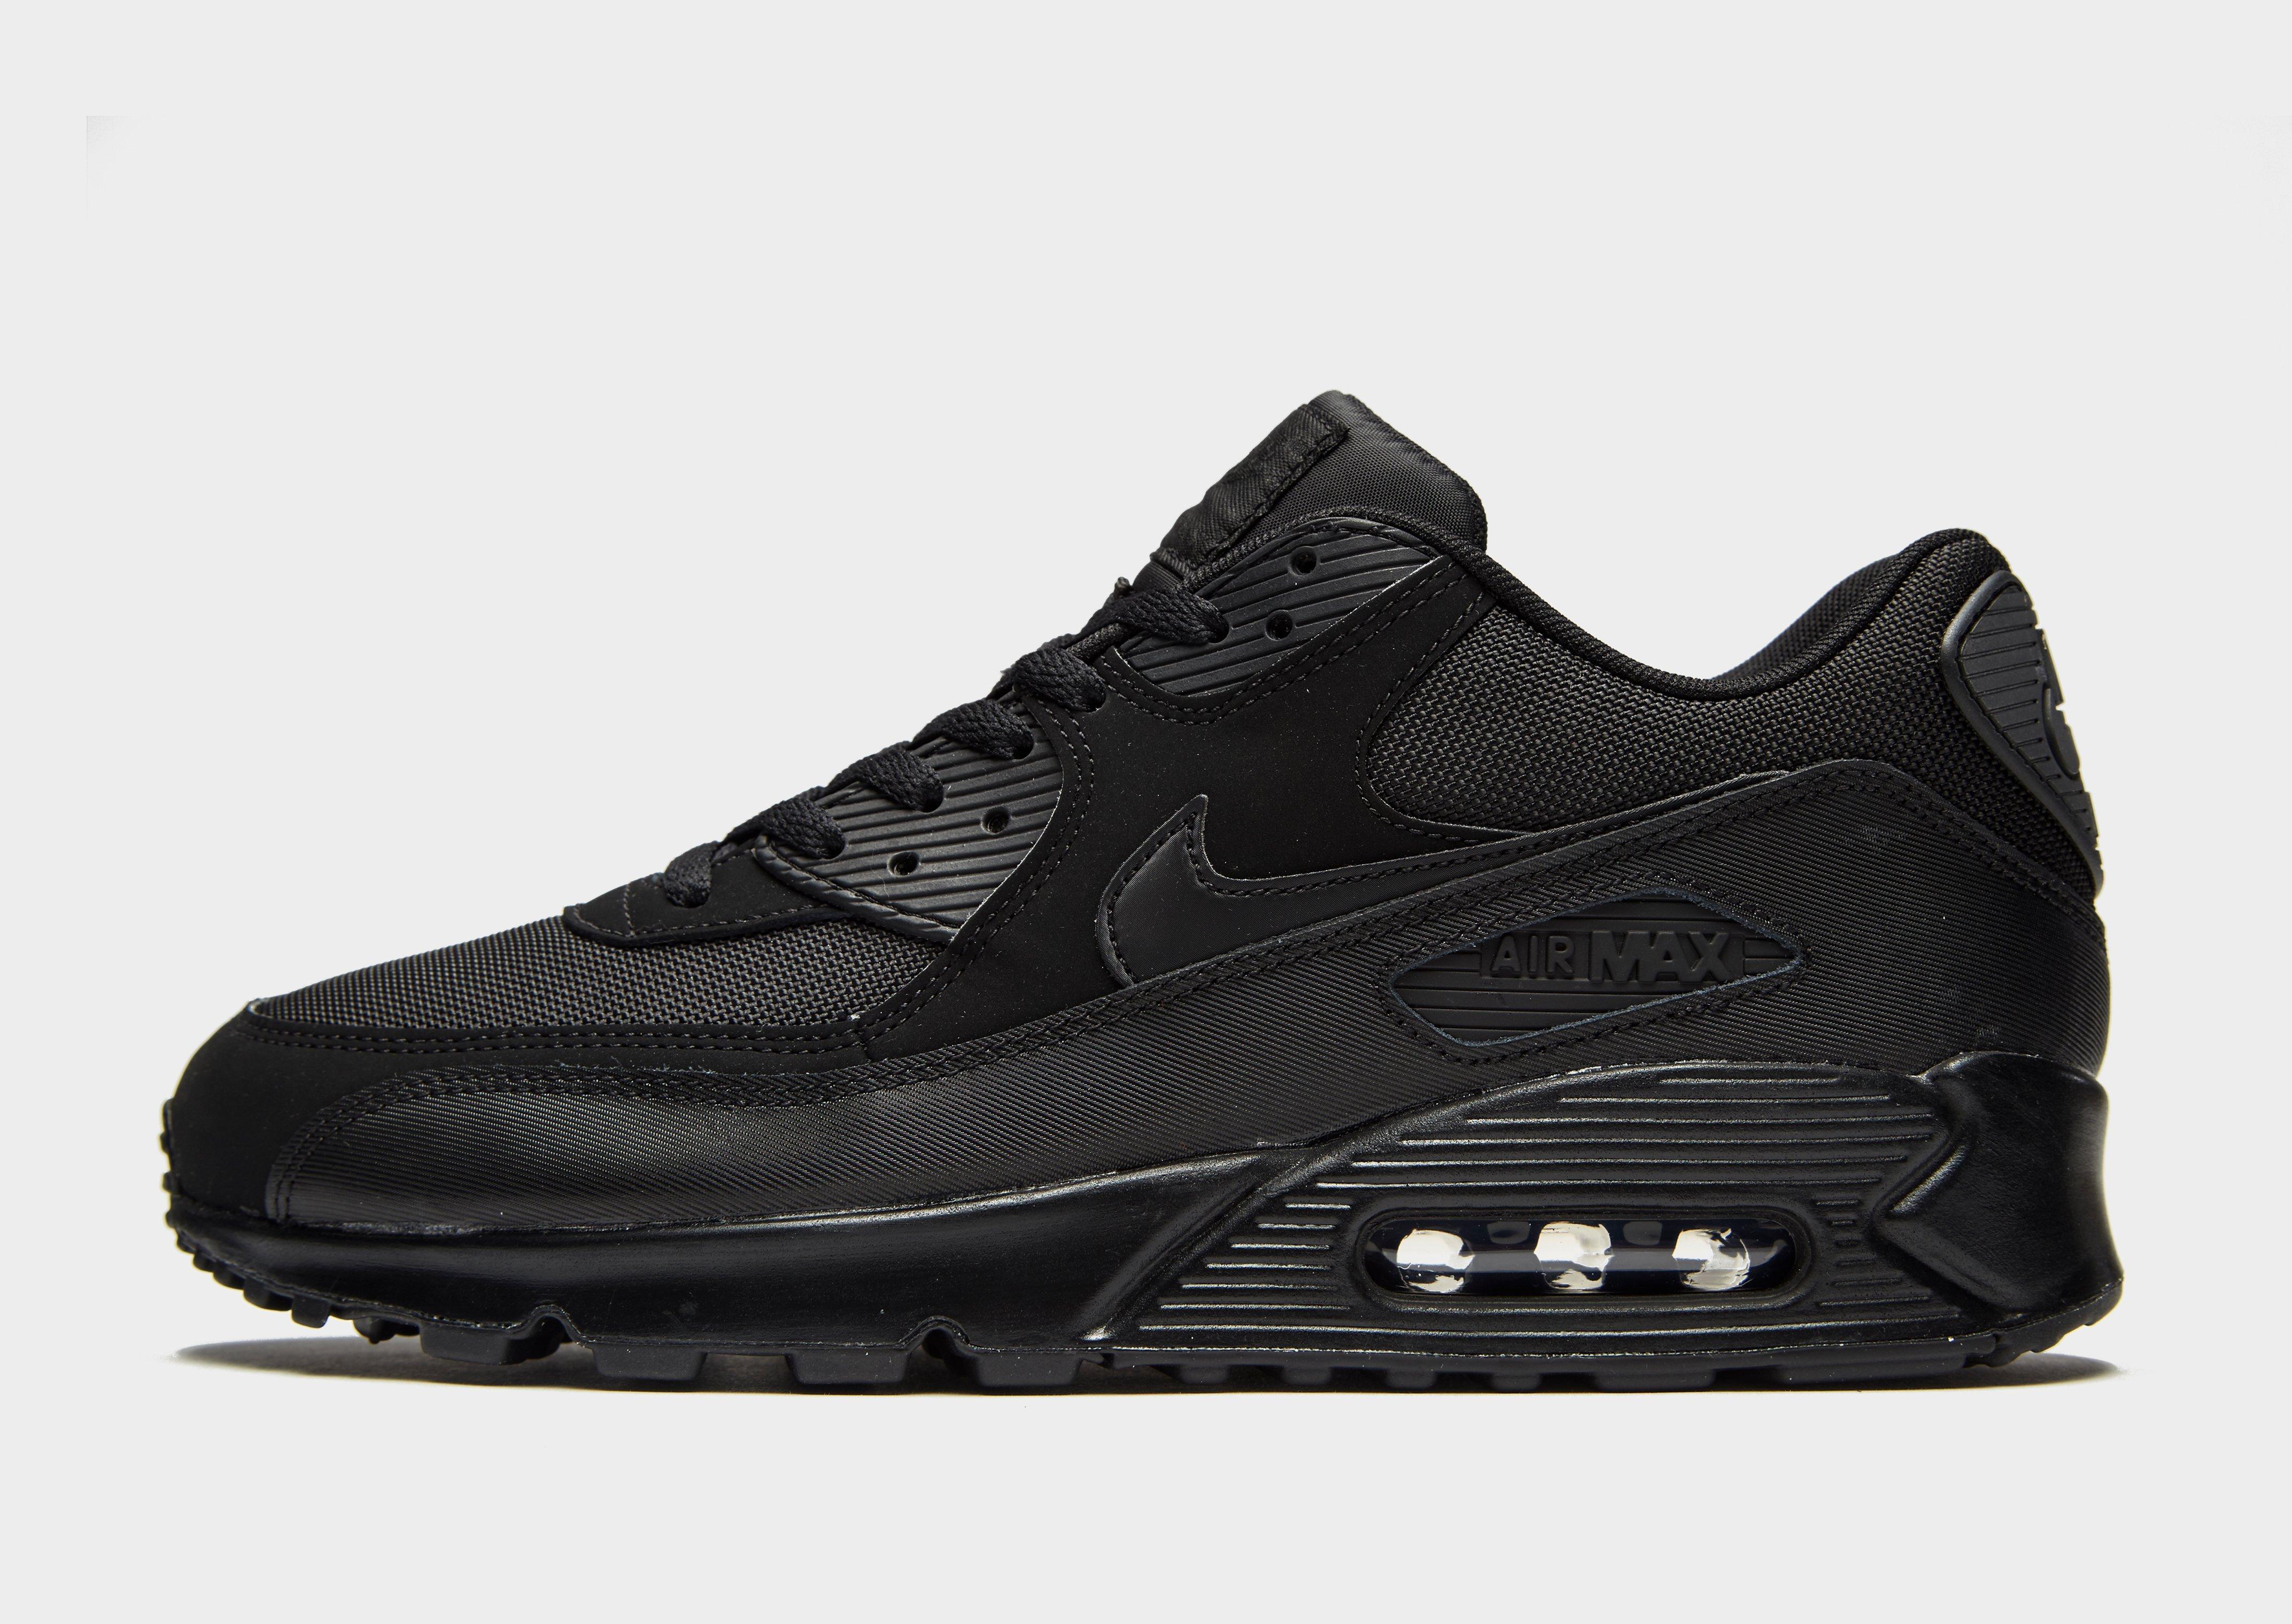 Nike SB Boys Janoski Air Max Black & White Skate Shoes | Zumiez